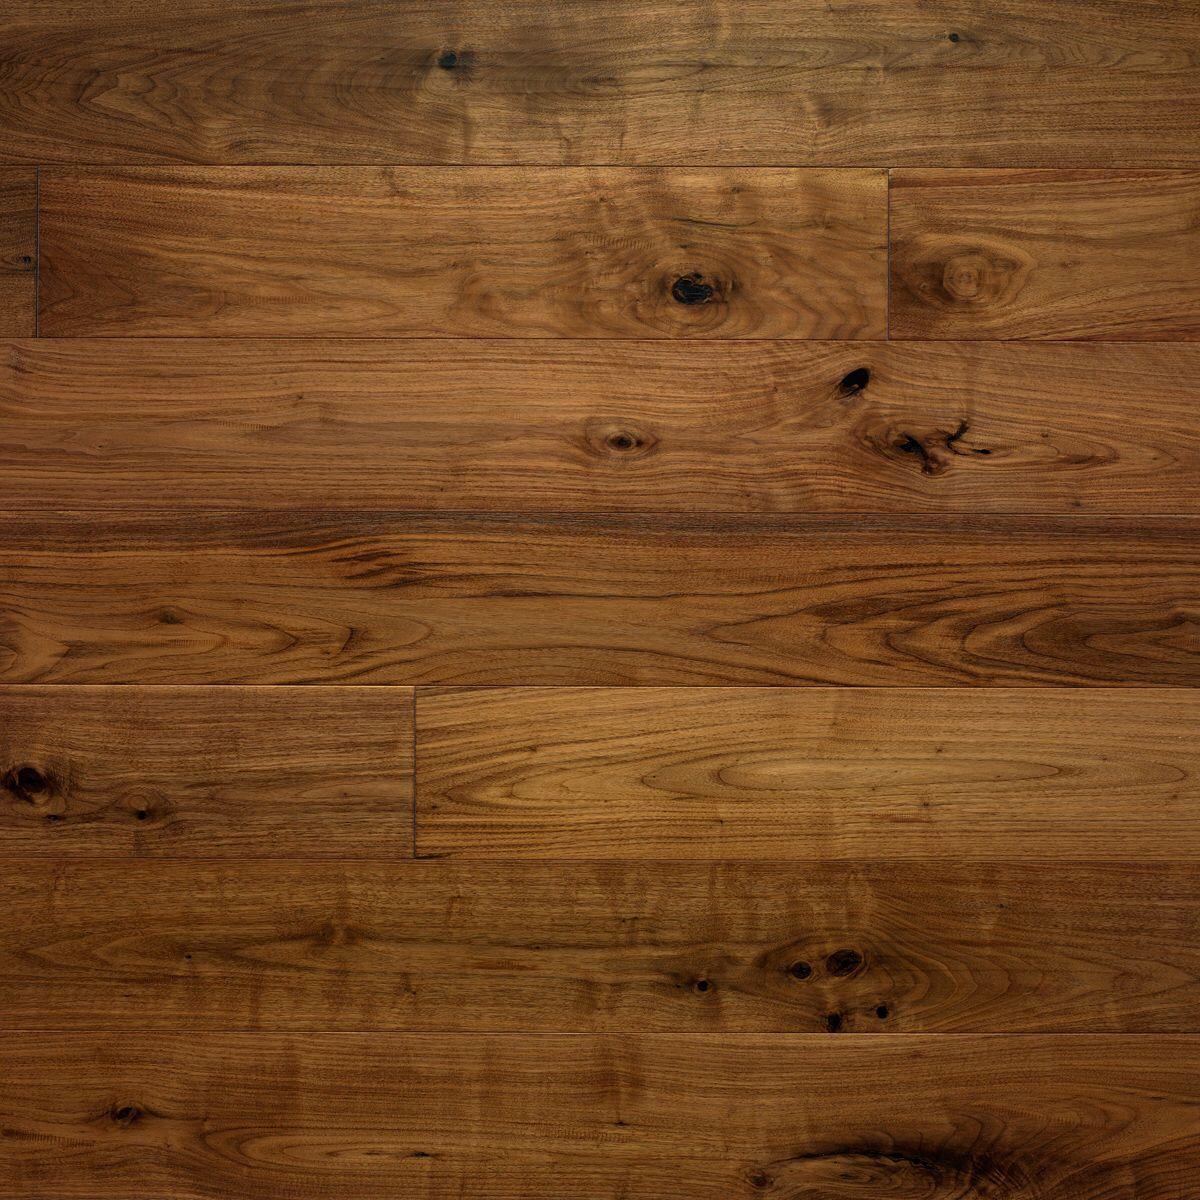 Kentwood Originals Sculpted Walnut Wide Plank Engineered Hardwood